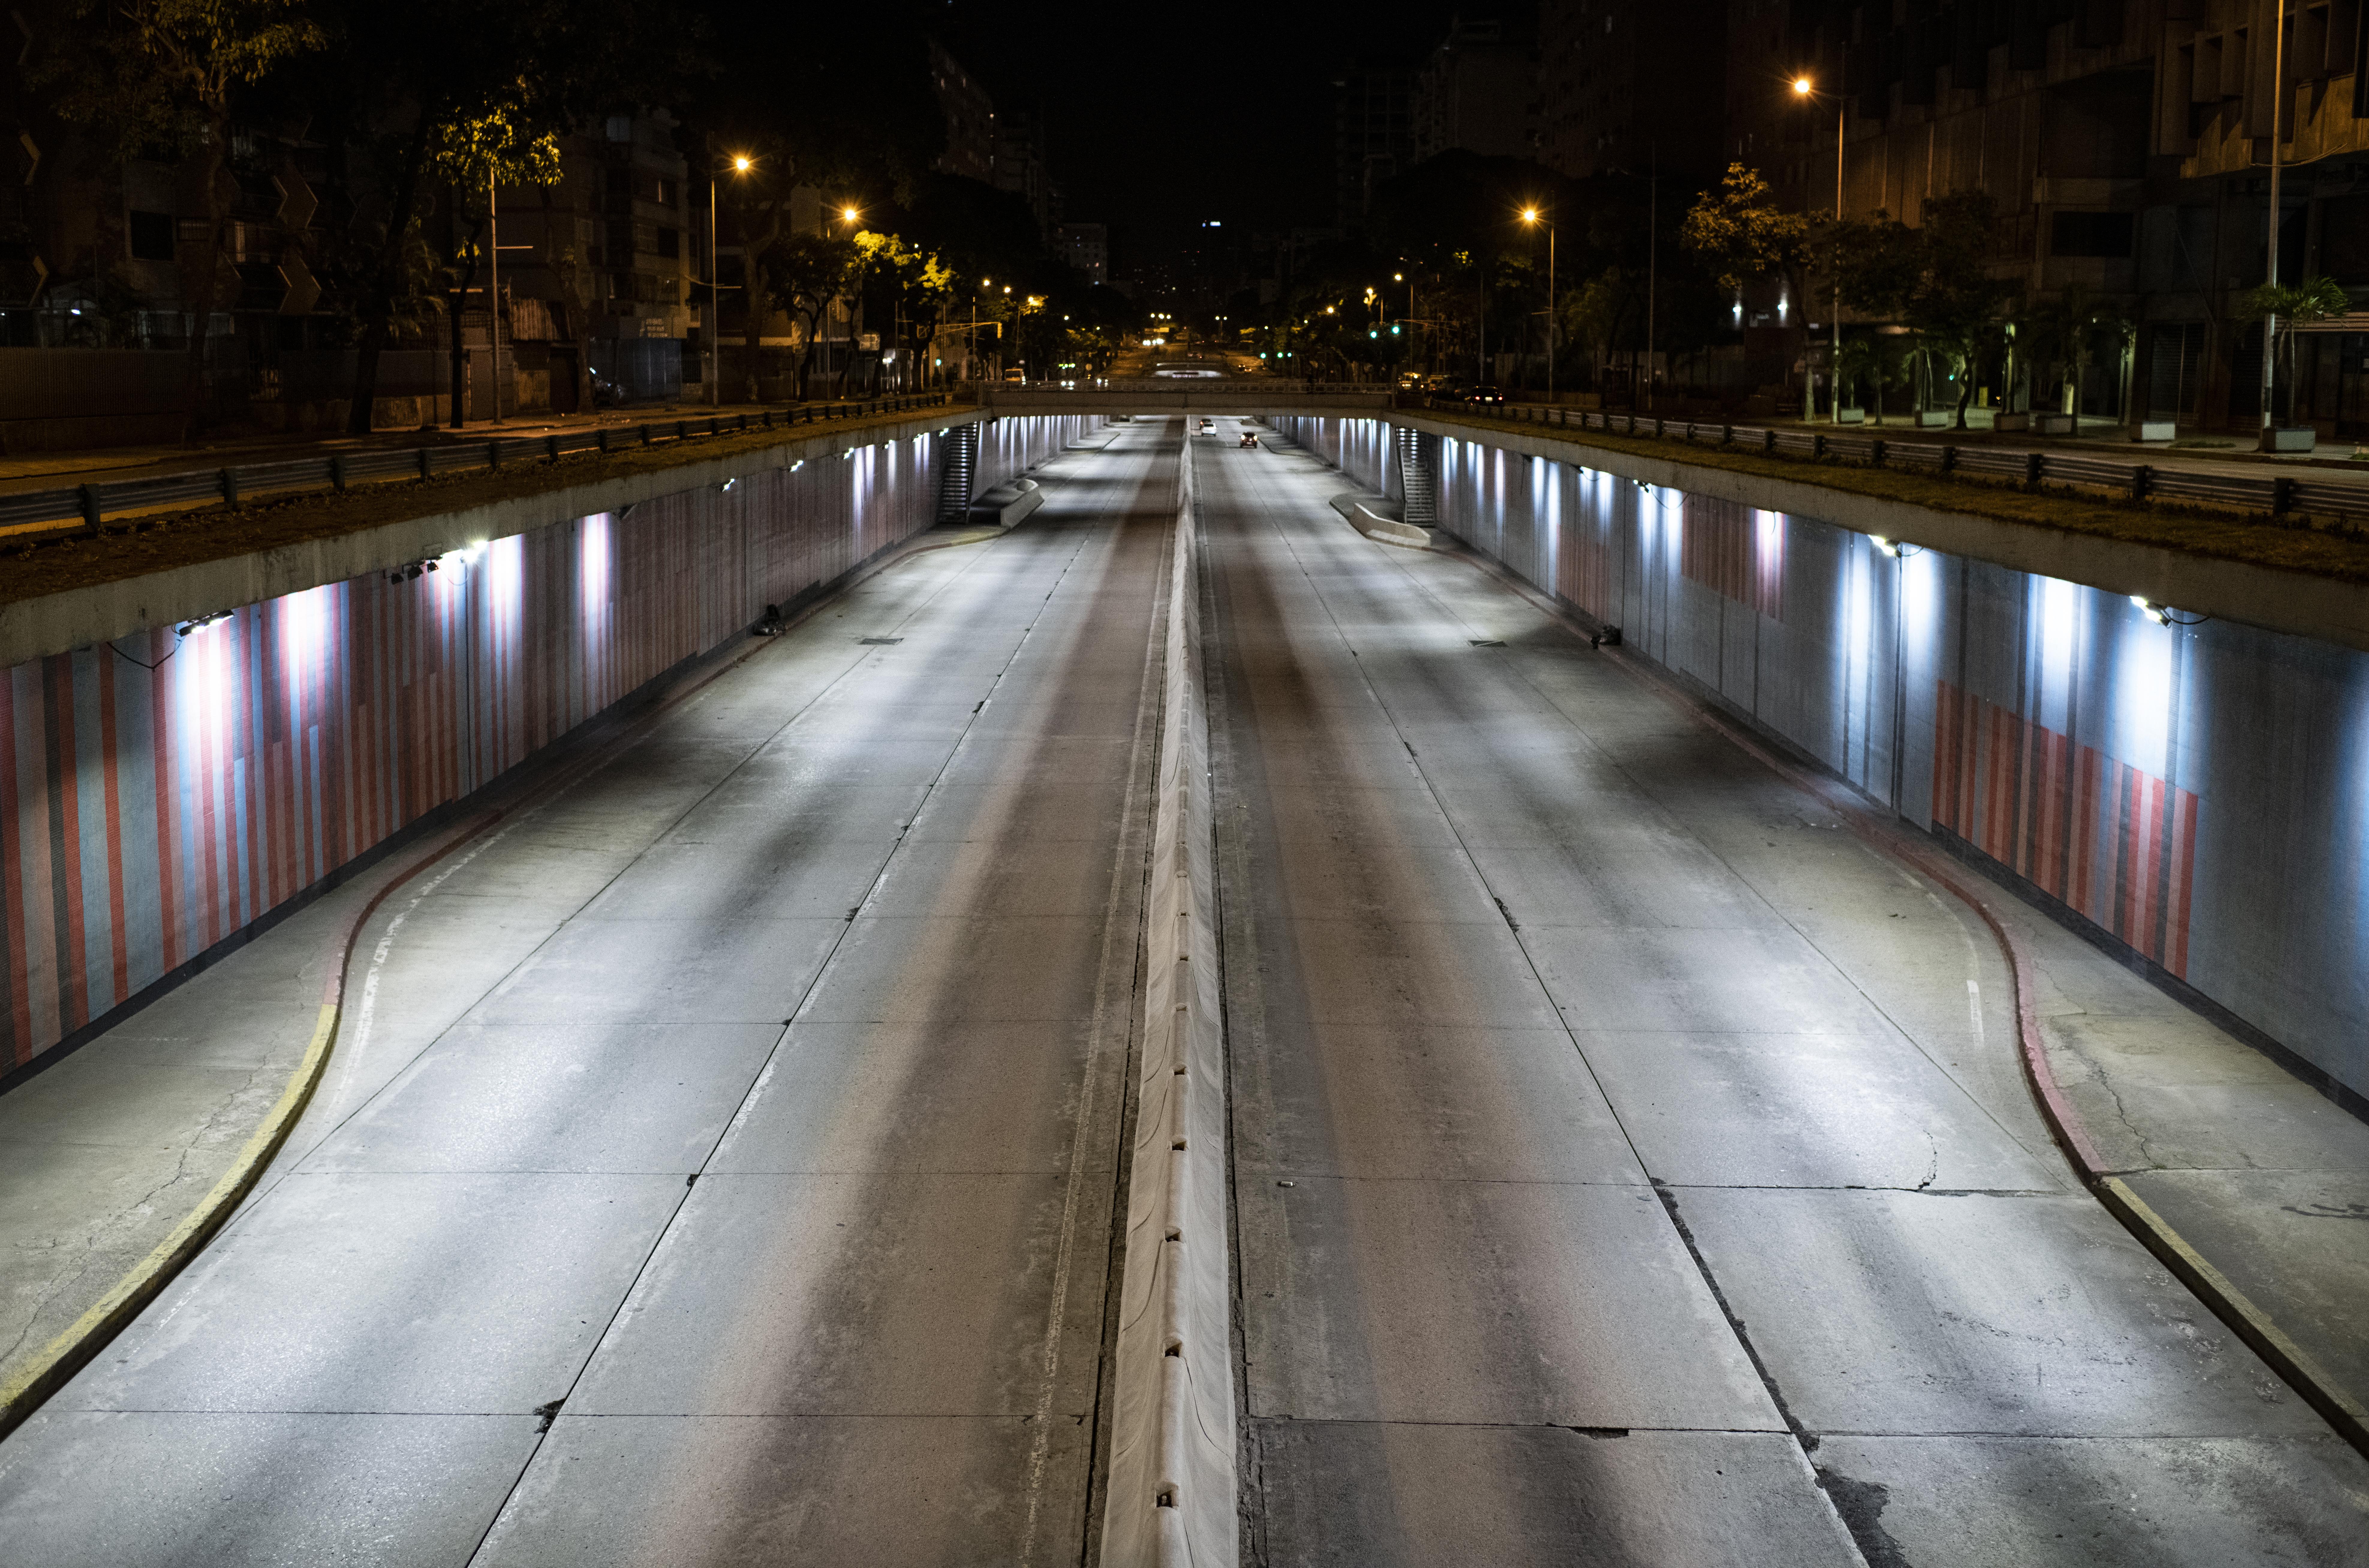 La avenida Libertador. (RONALDO SCHEMIDT / AFP)